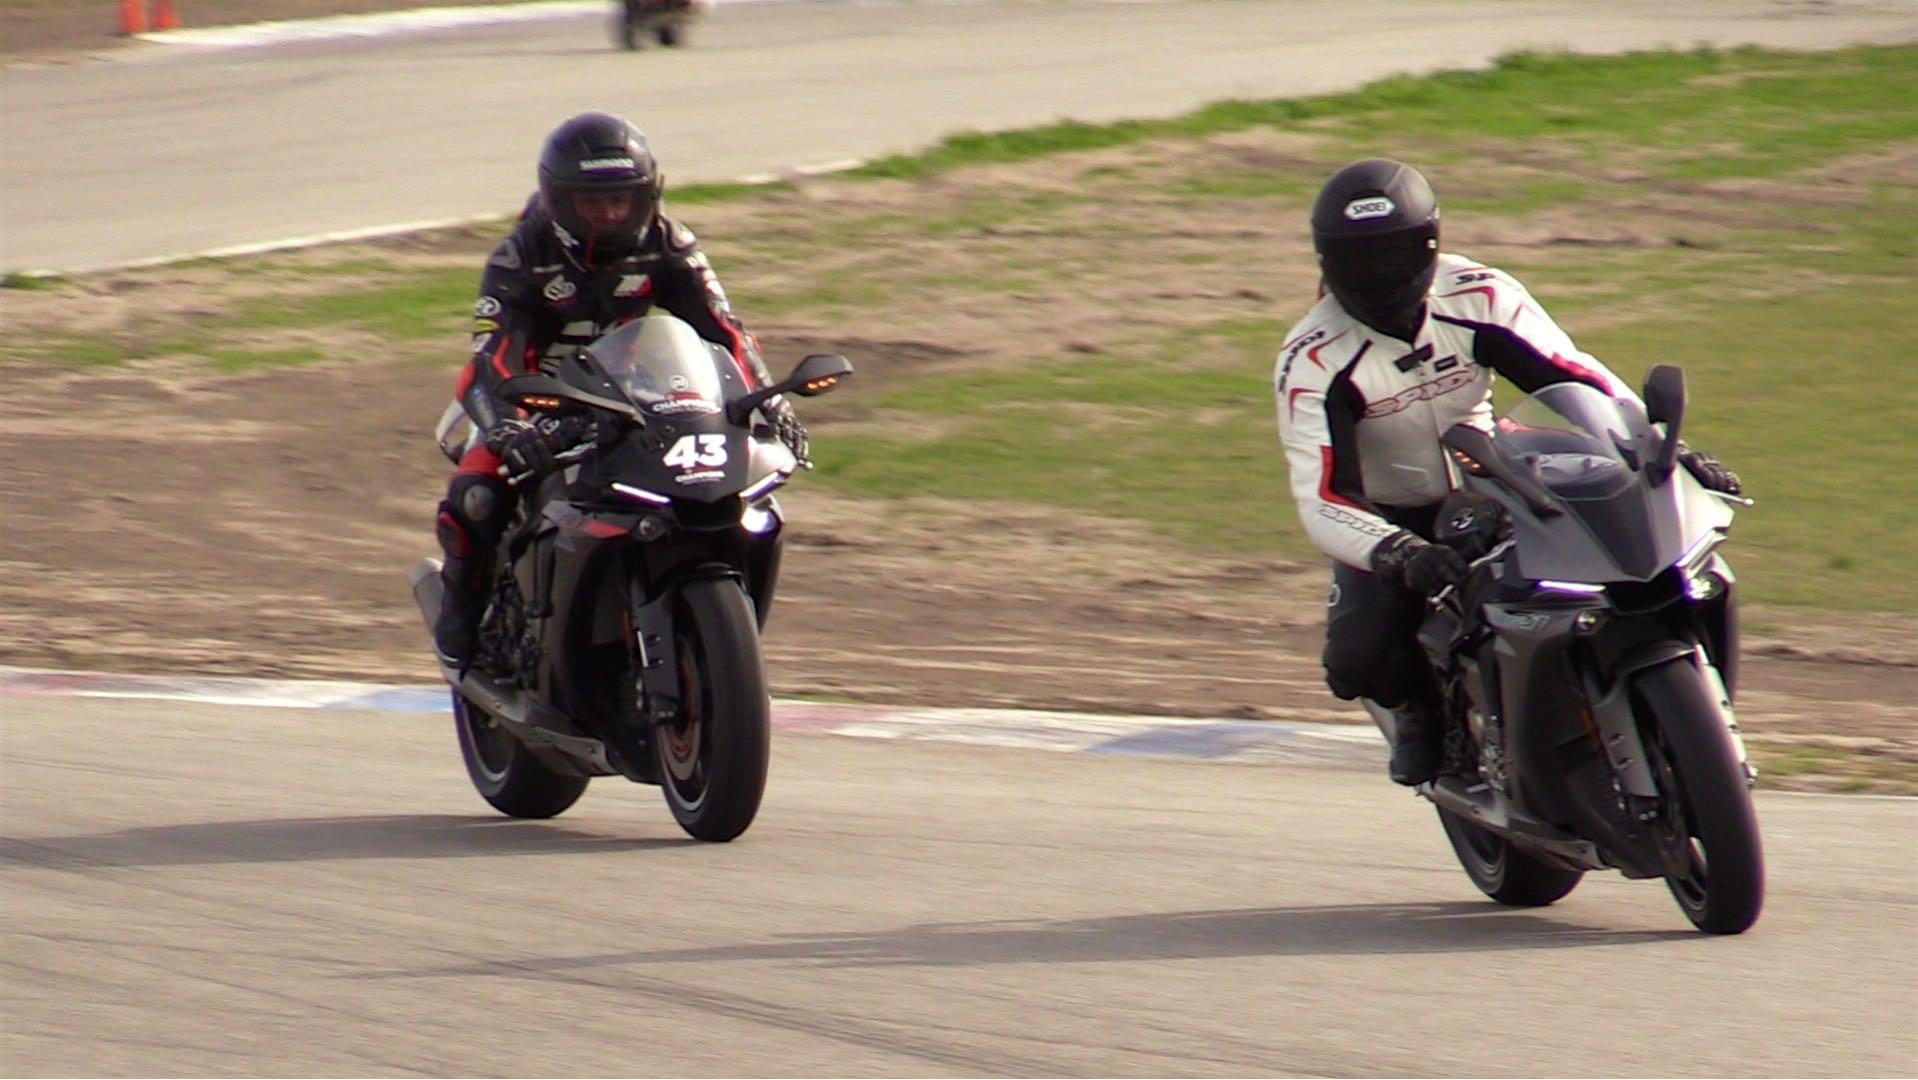 Yamaha Champions Riding School author rides